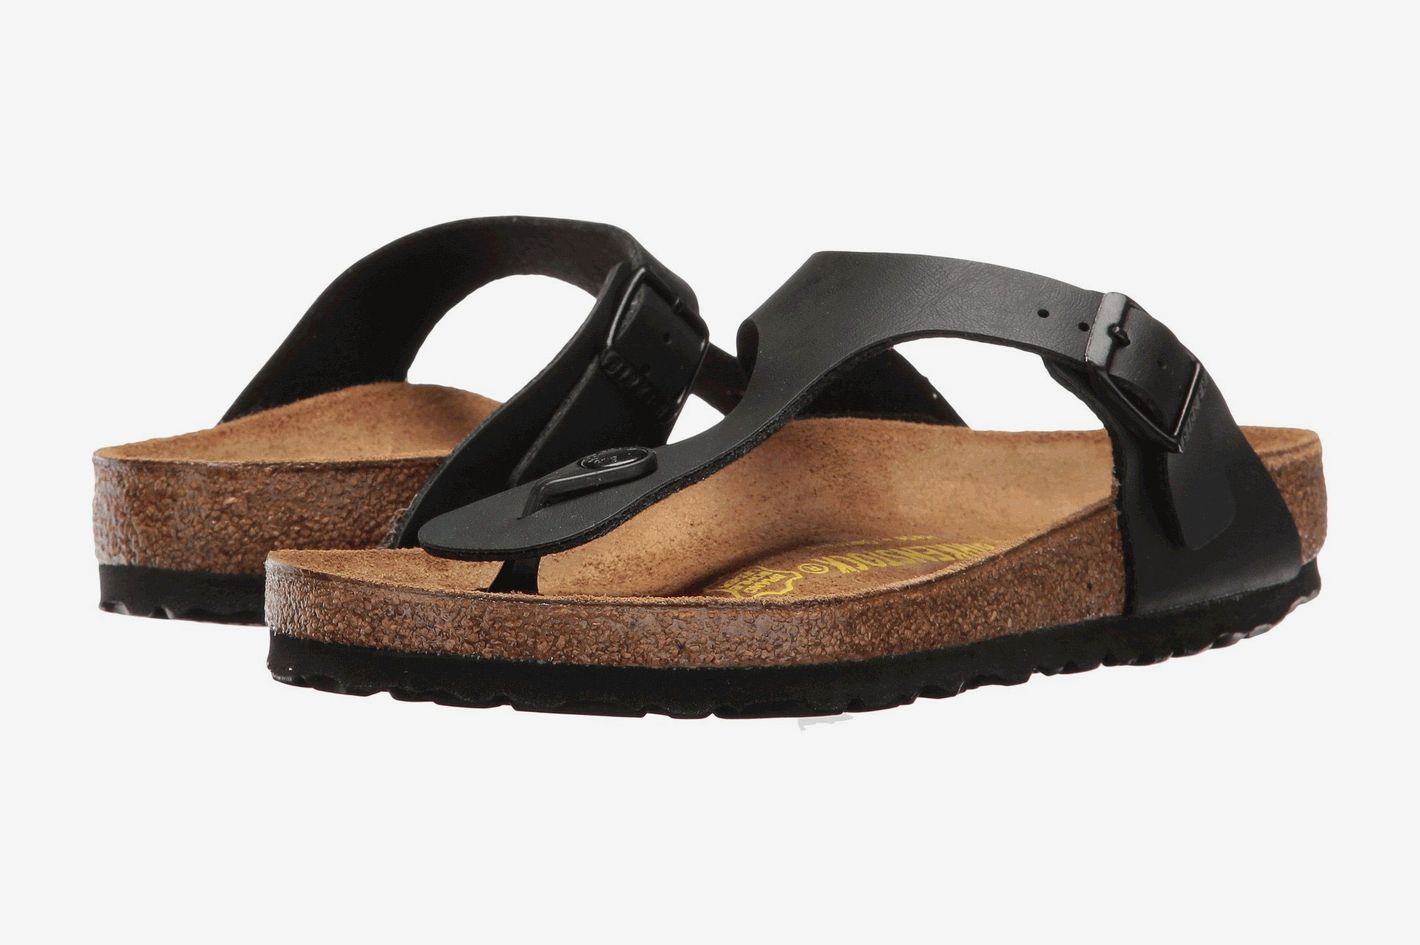 5dc65ead6 The best orthopedic sandals. Birkenstock Gizeh